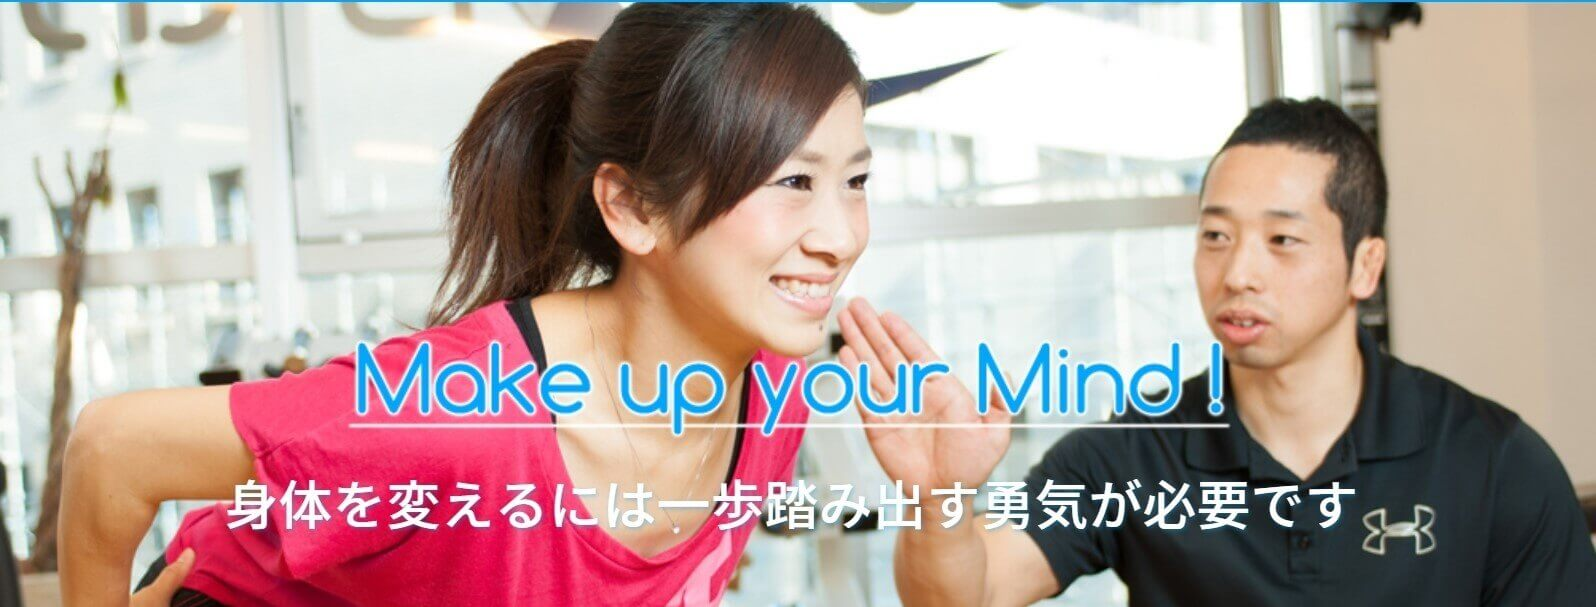 Bodybase 千葉 パーソナルトレーニング TOP